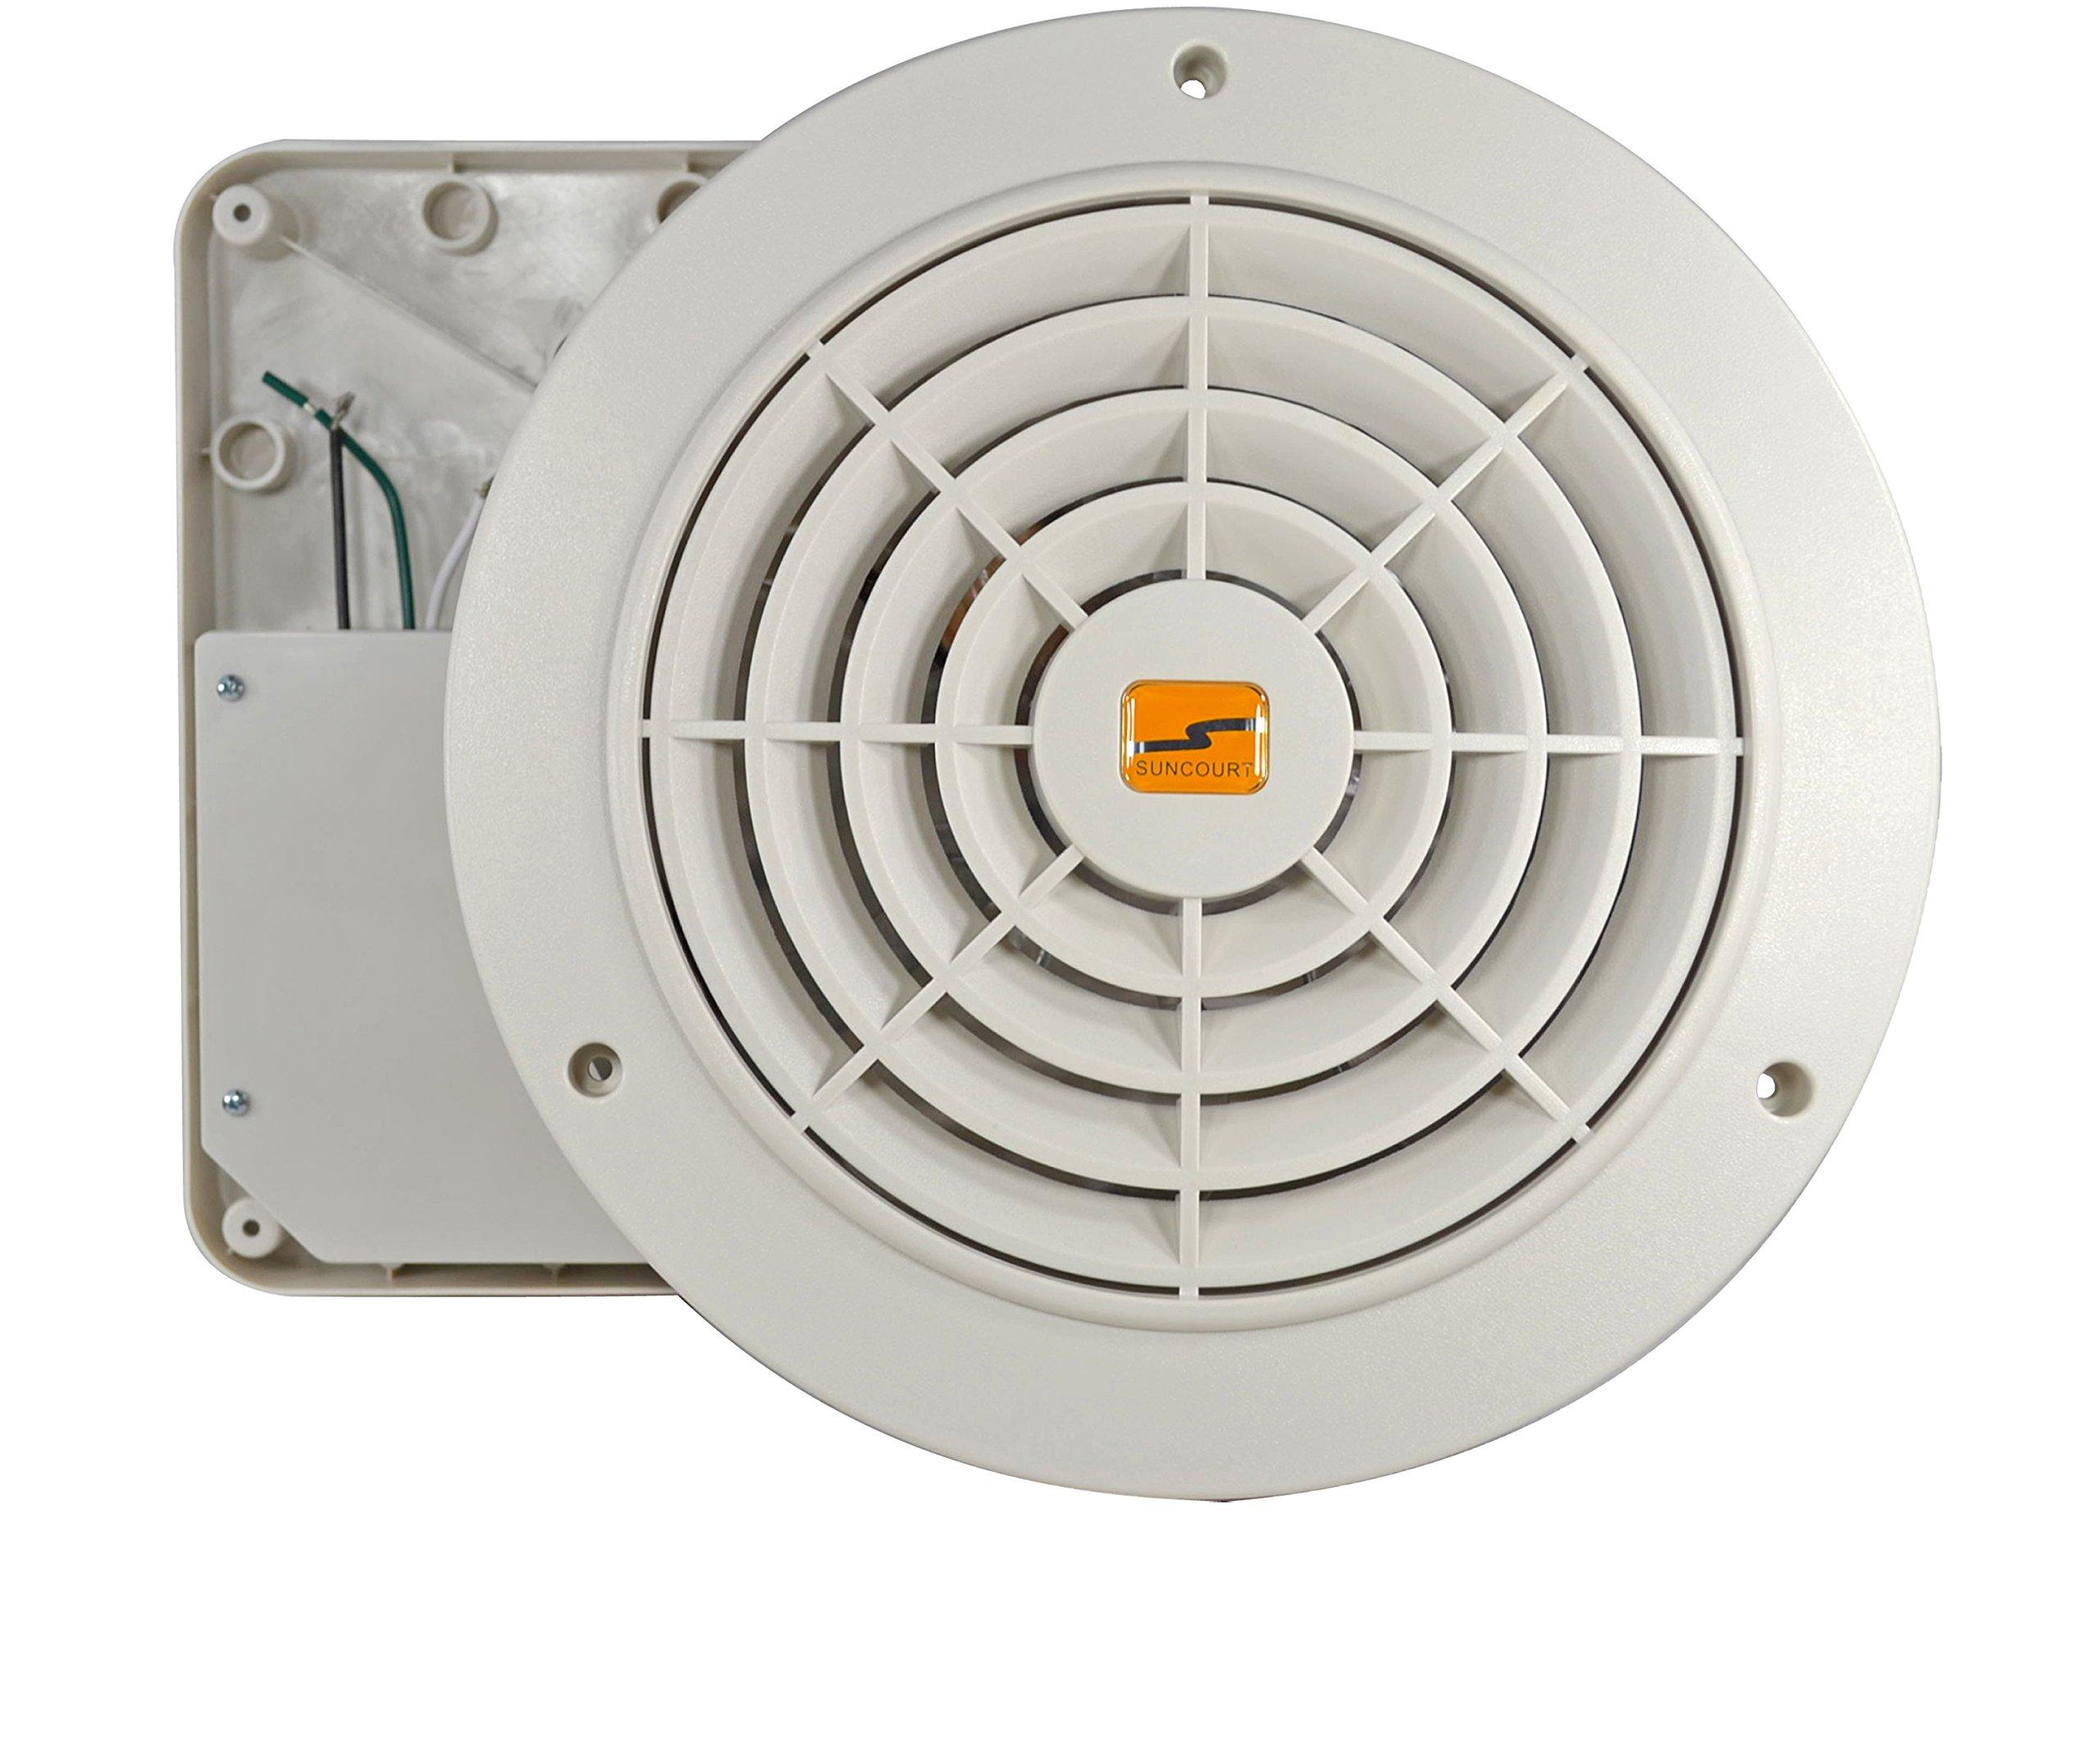 Suncourt Thru Wall Fan Hardwired Variable Speed by Suncourt